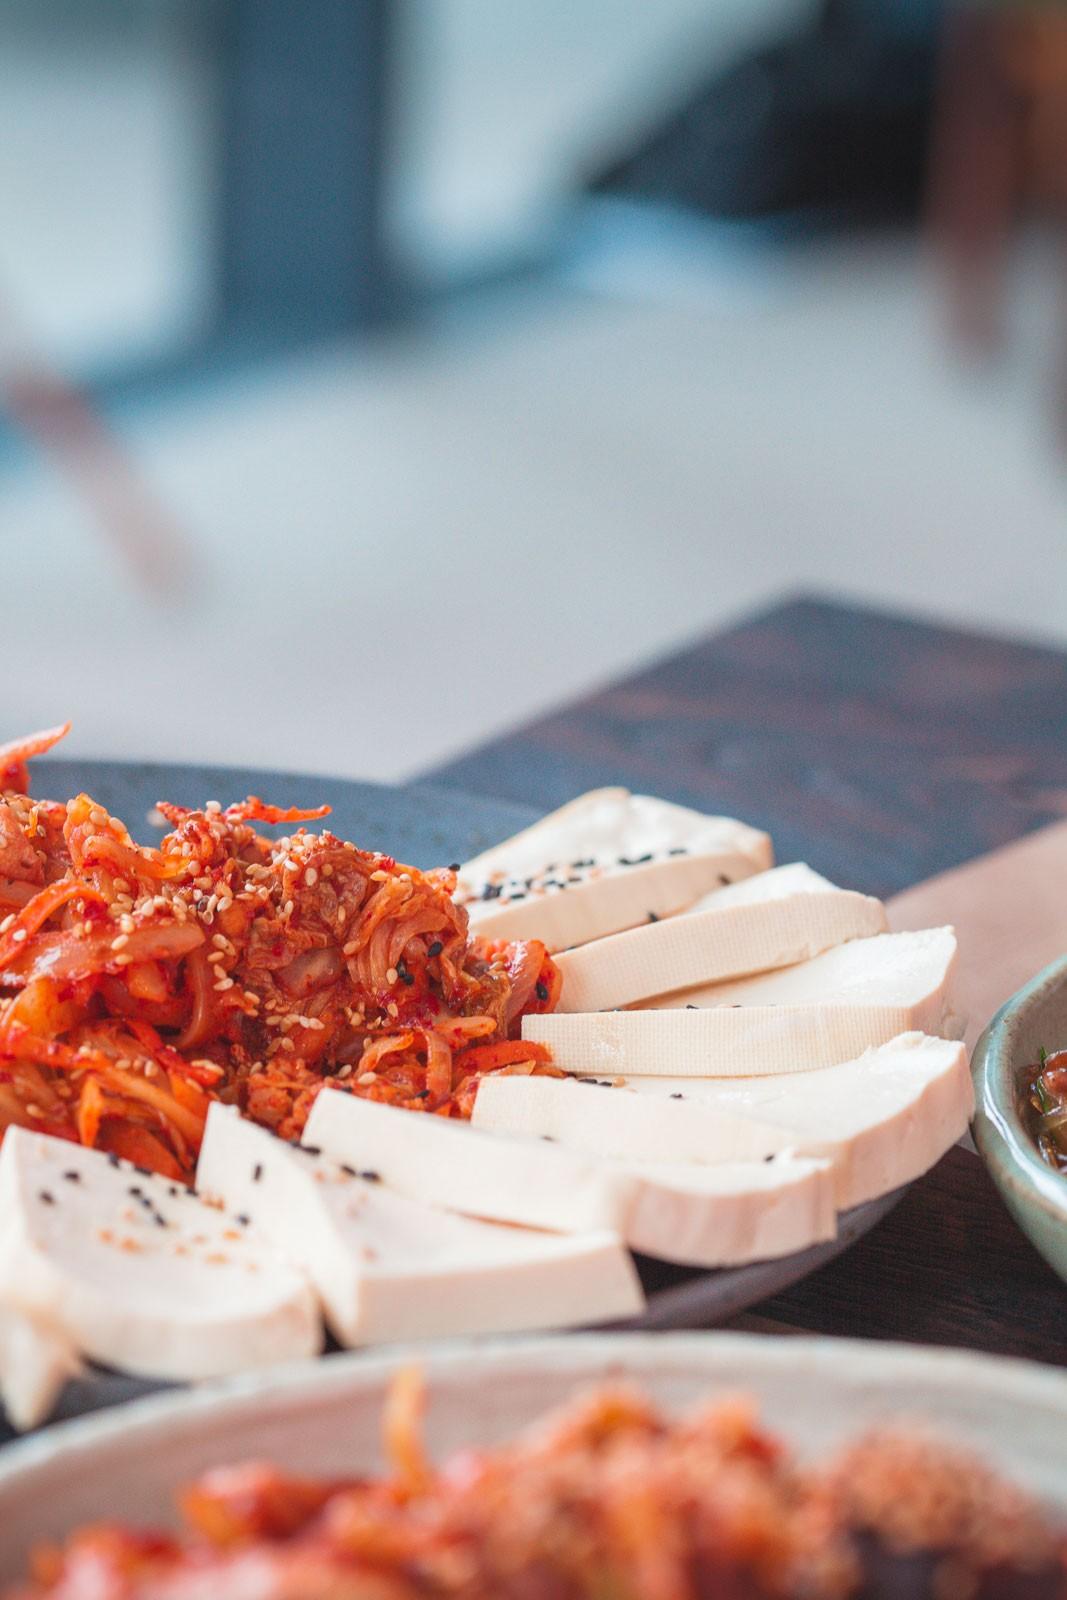 Comptoir coréen, Restaurant coréen, Paris, maison de Corée, cite universitaire paris, paris 14e, ninaah bulles, repa, Jajang Tteokbokki, dubu kimchi, Japchae Dubap, Soondae bokkeum, Makkoli, repas